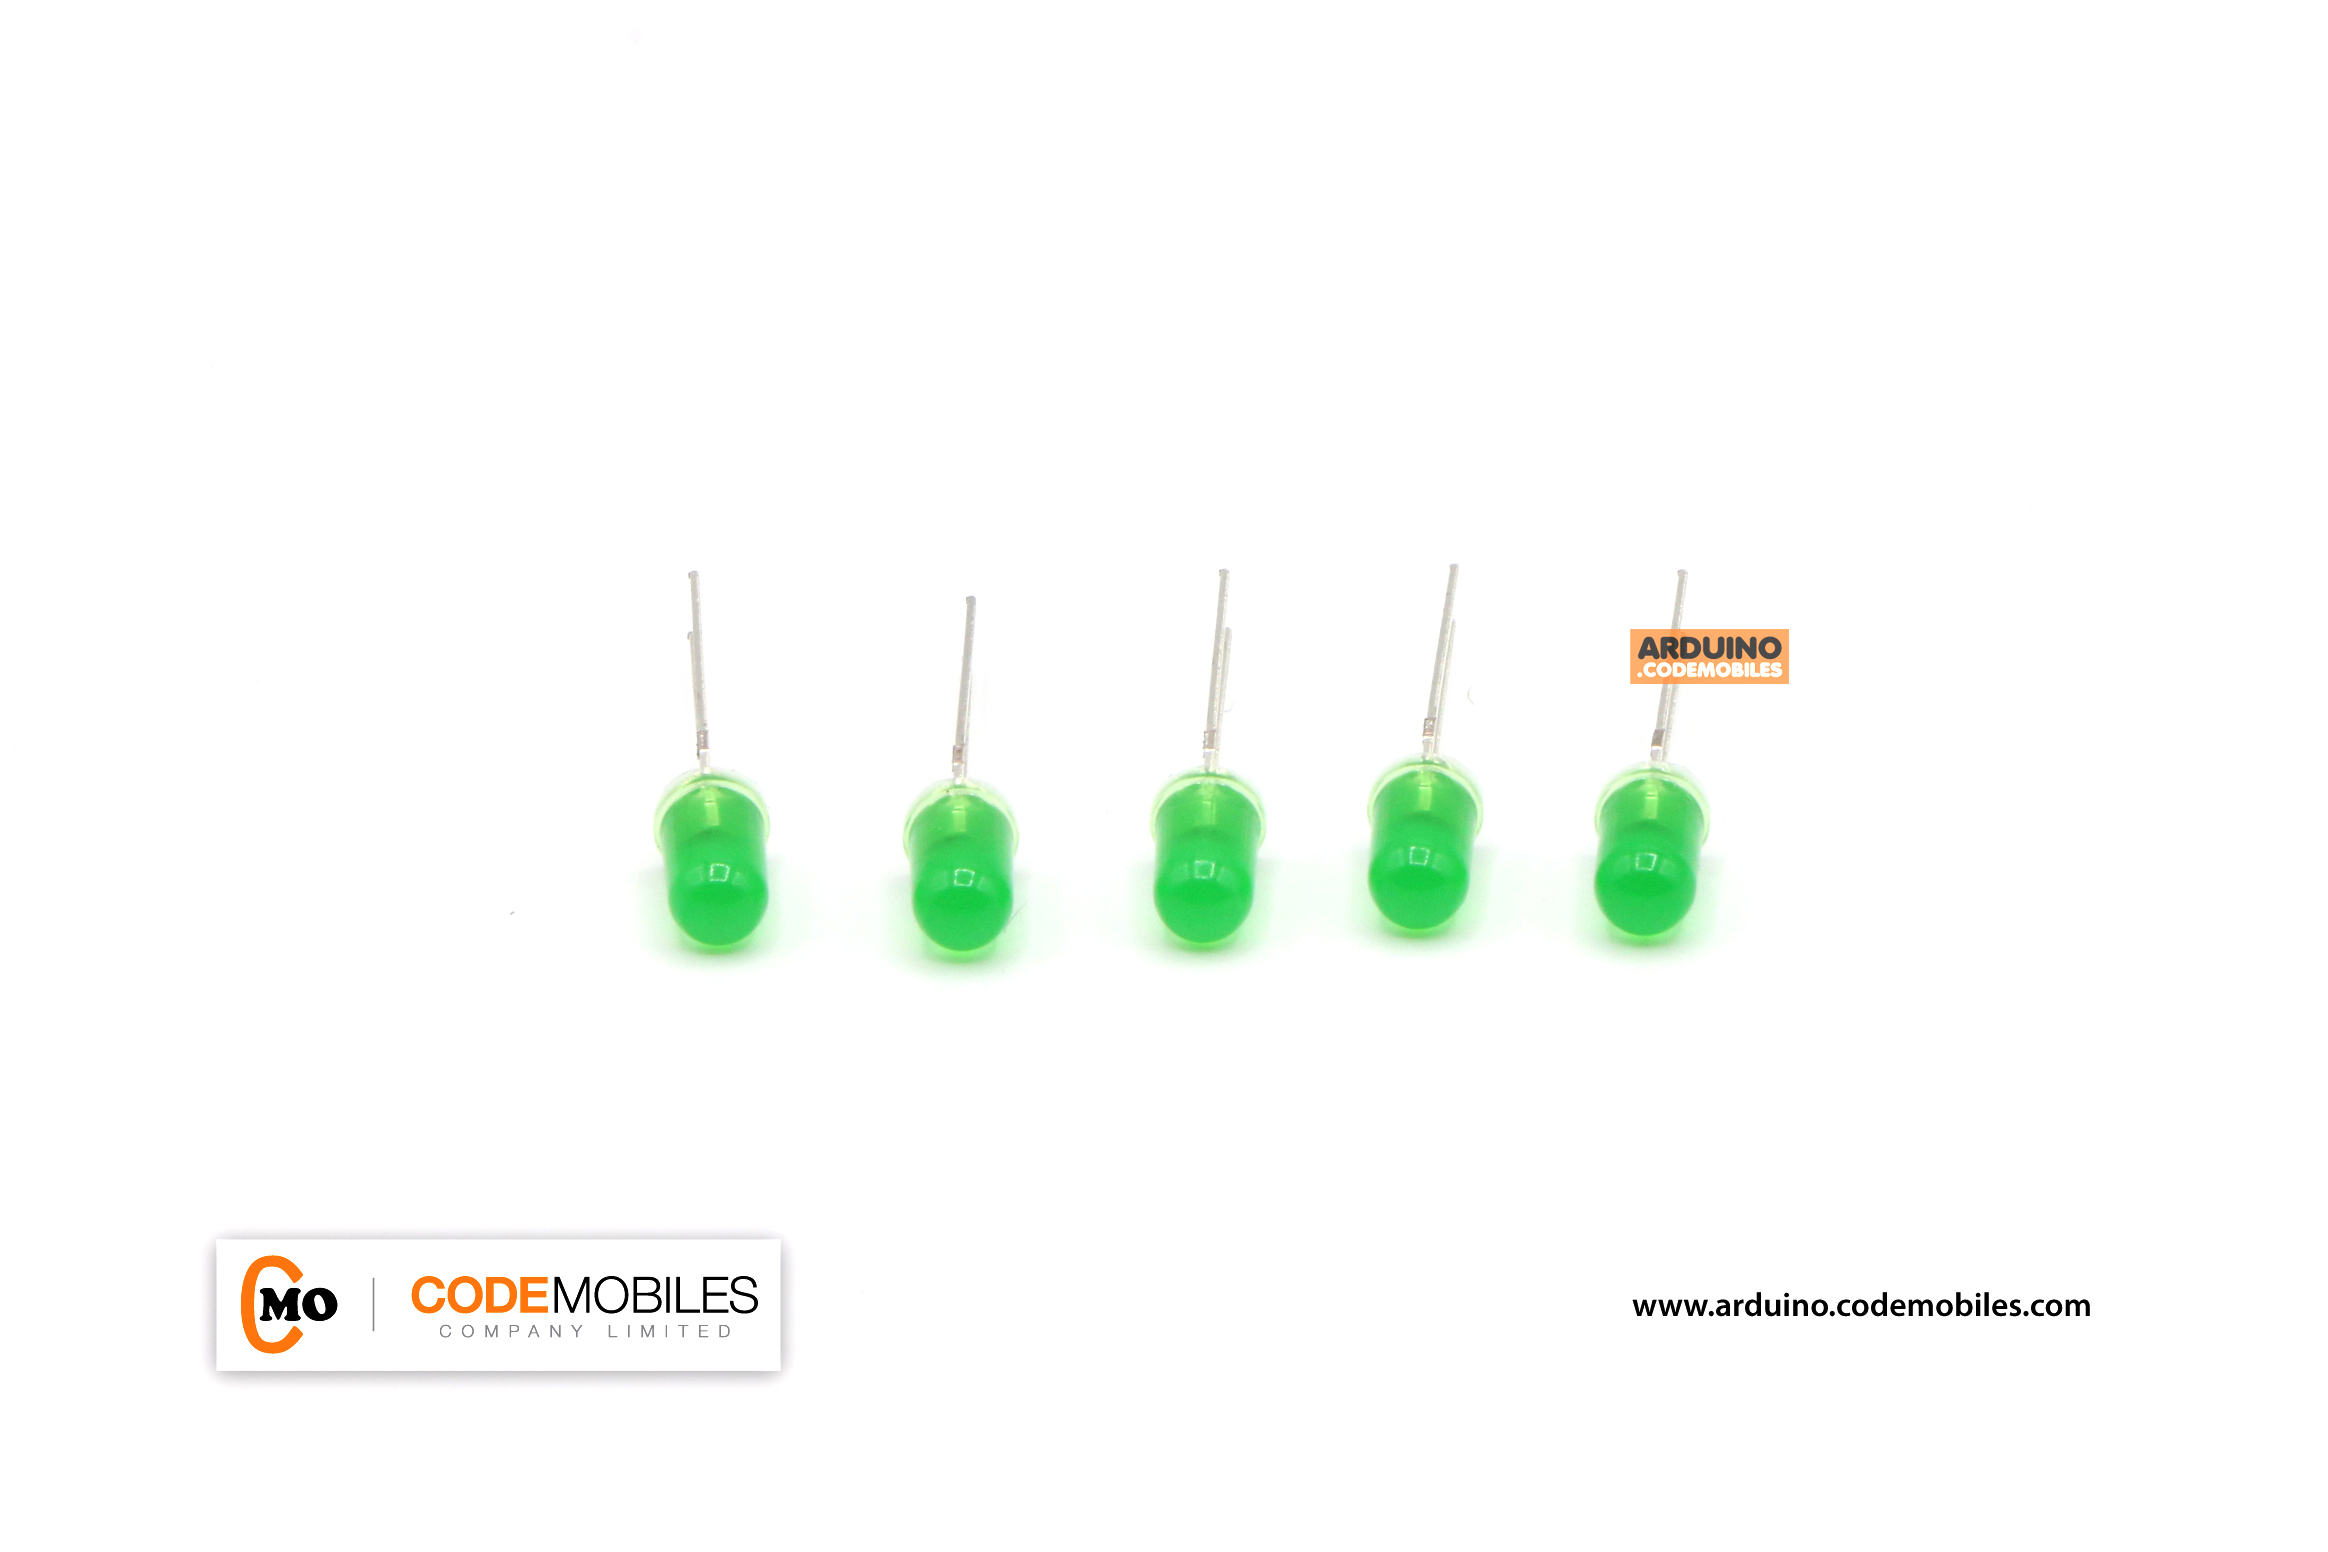 LED 5mm สีเขียว จำนวน 5 ชิ้น